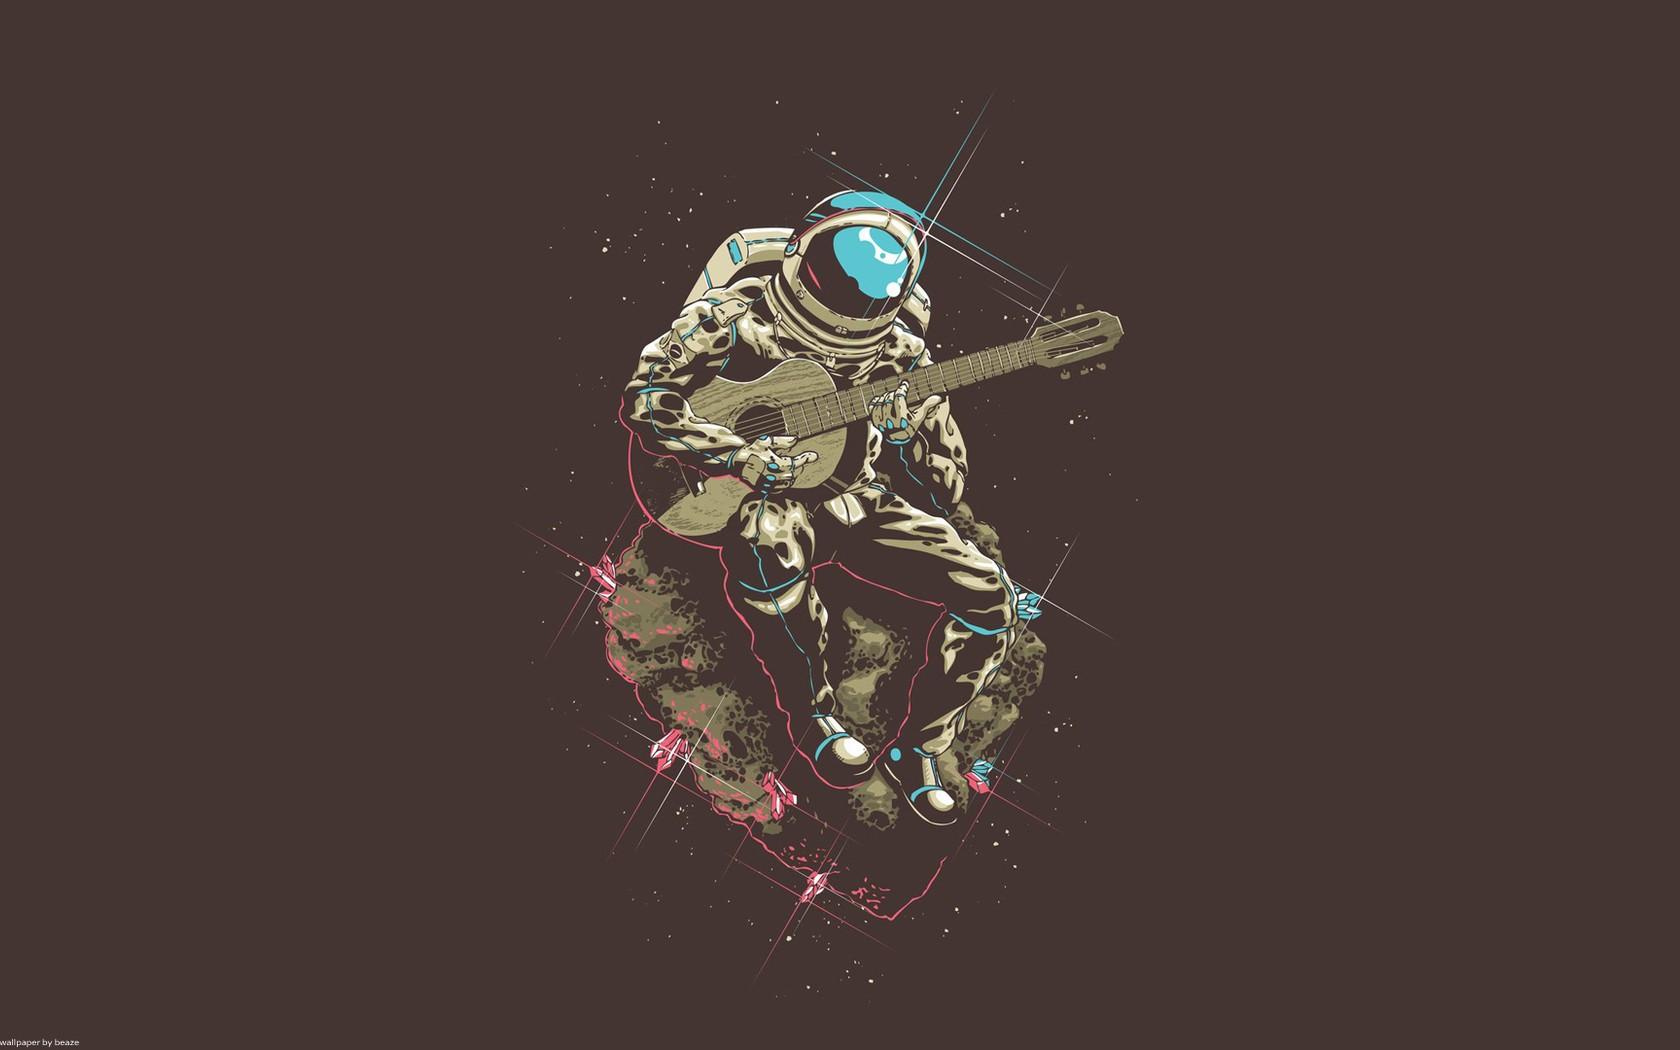 Astronaut Cat Wallpaper Astronauts wallpaper 1680x1050